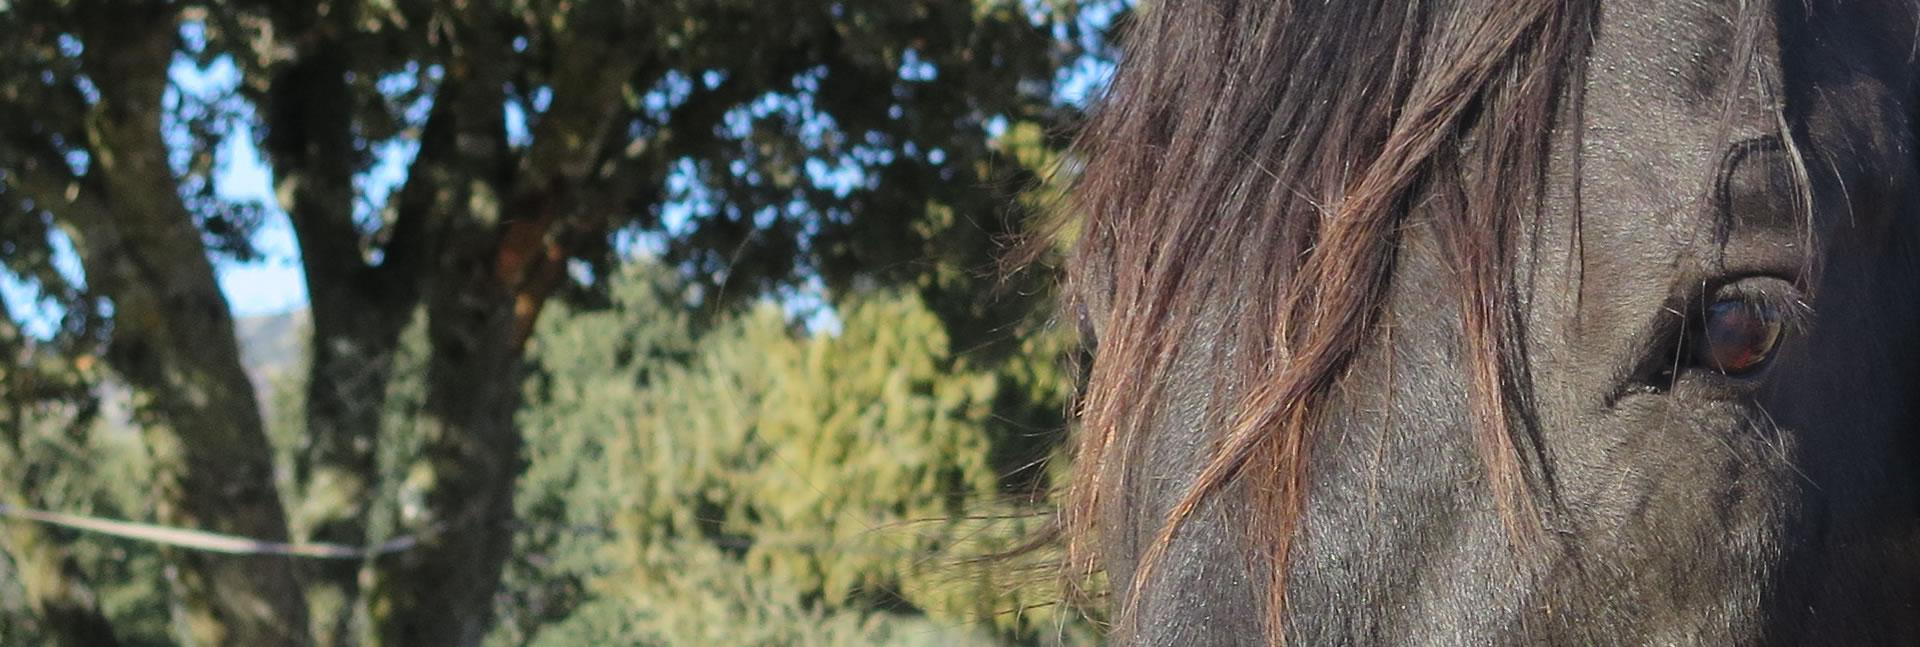 Cuidamos de tu caballo